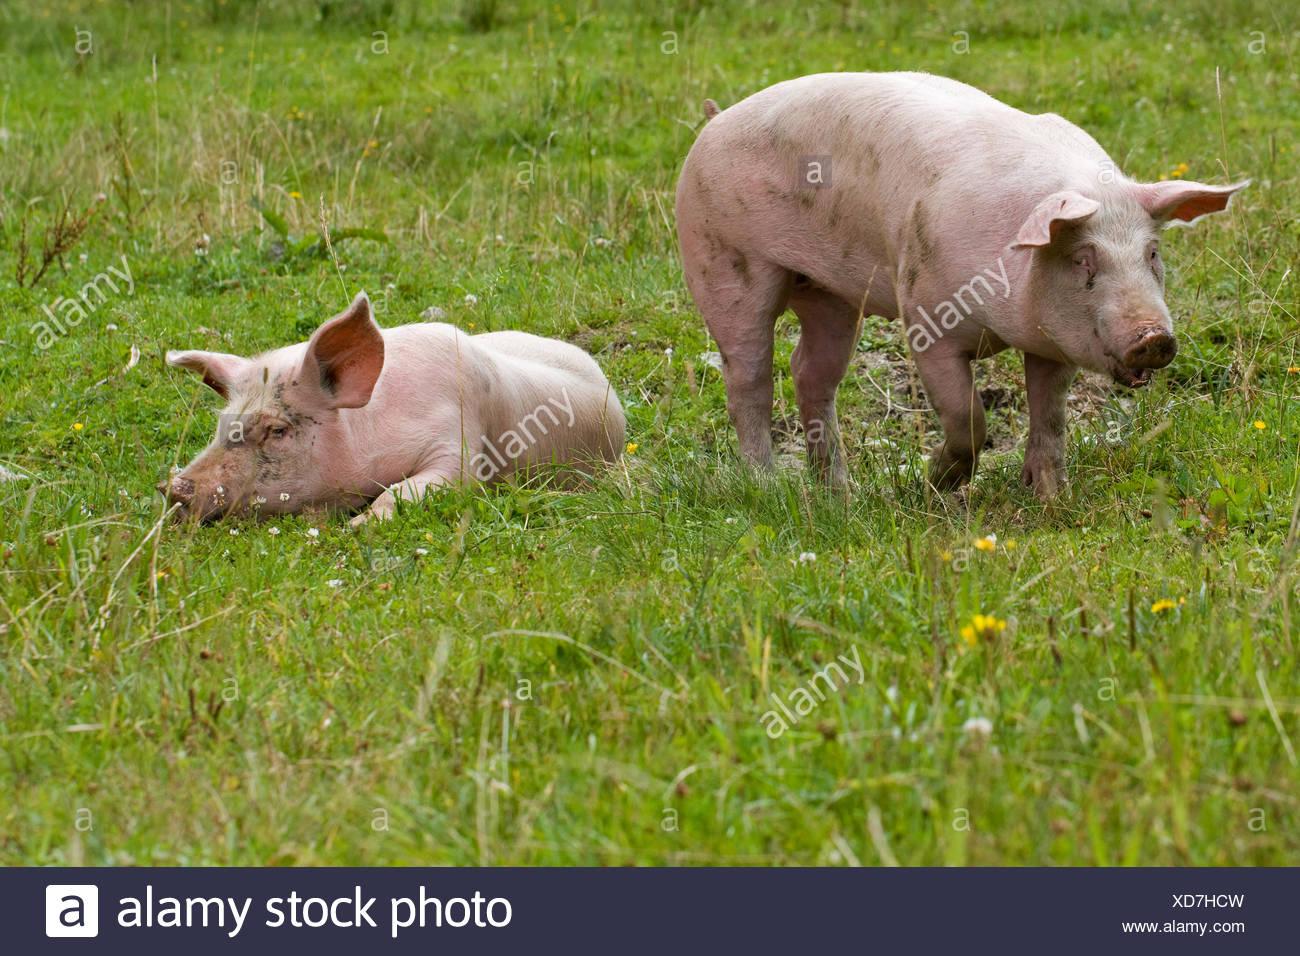 pigs - Stock Image